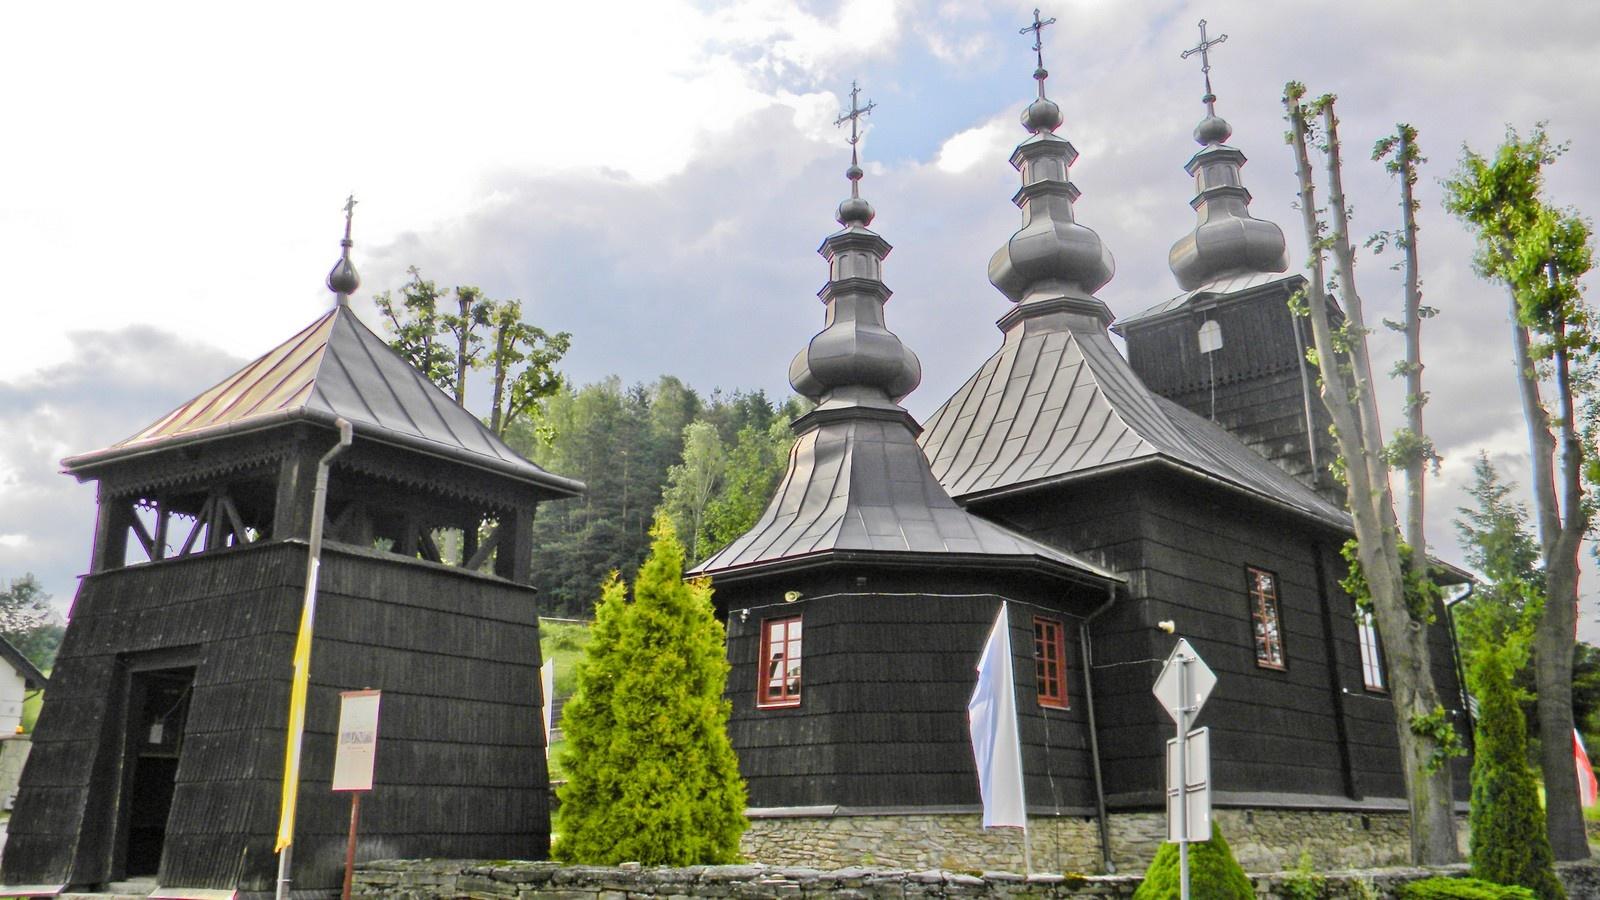 https://images92.fotosik.pl/207/8586d1928bcfa765.jpg